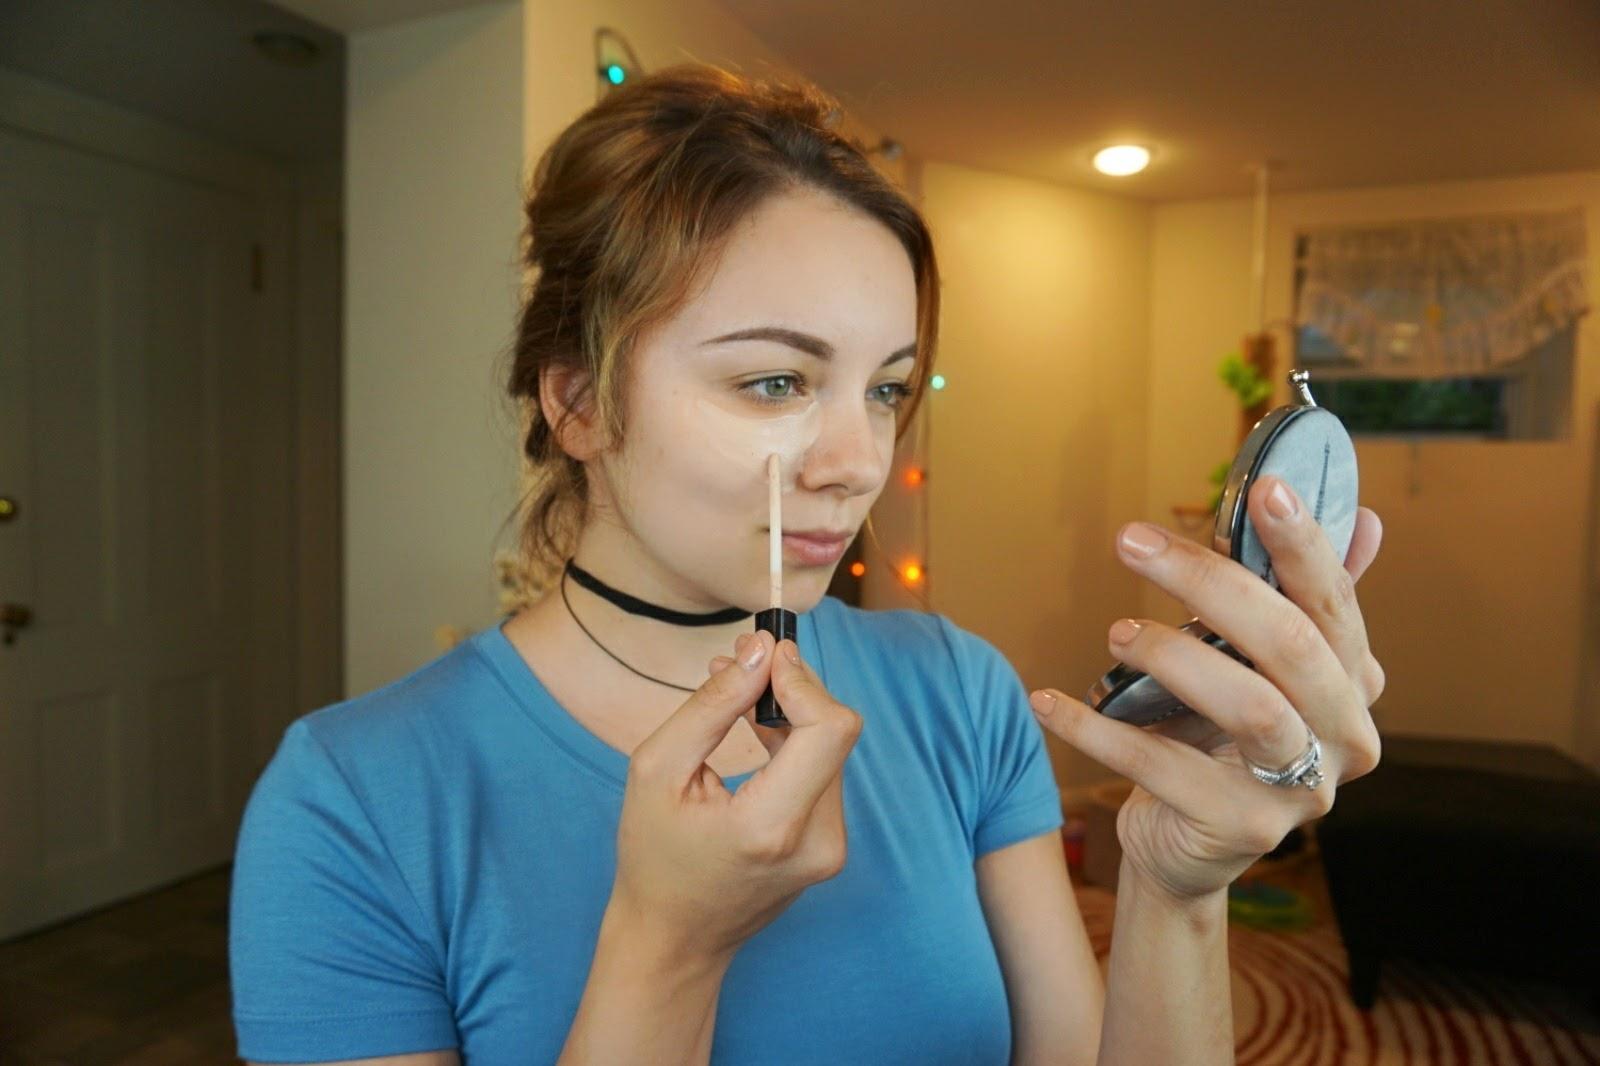 A girl applying concealer on top of peach concealer under her eyes.